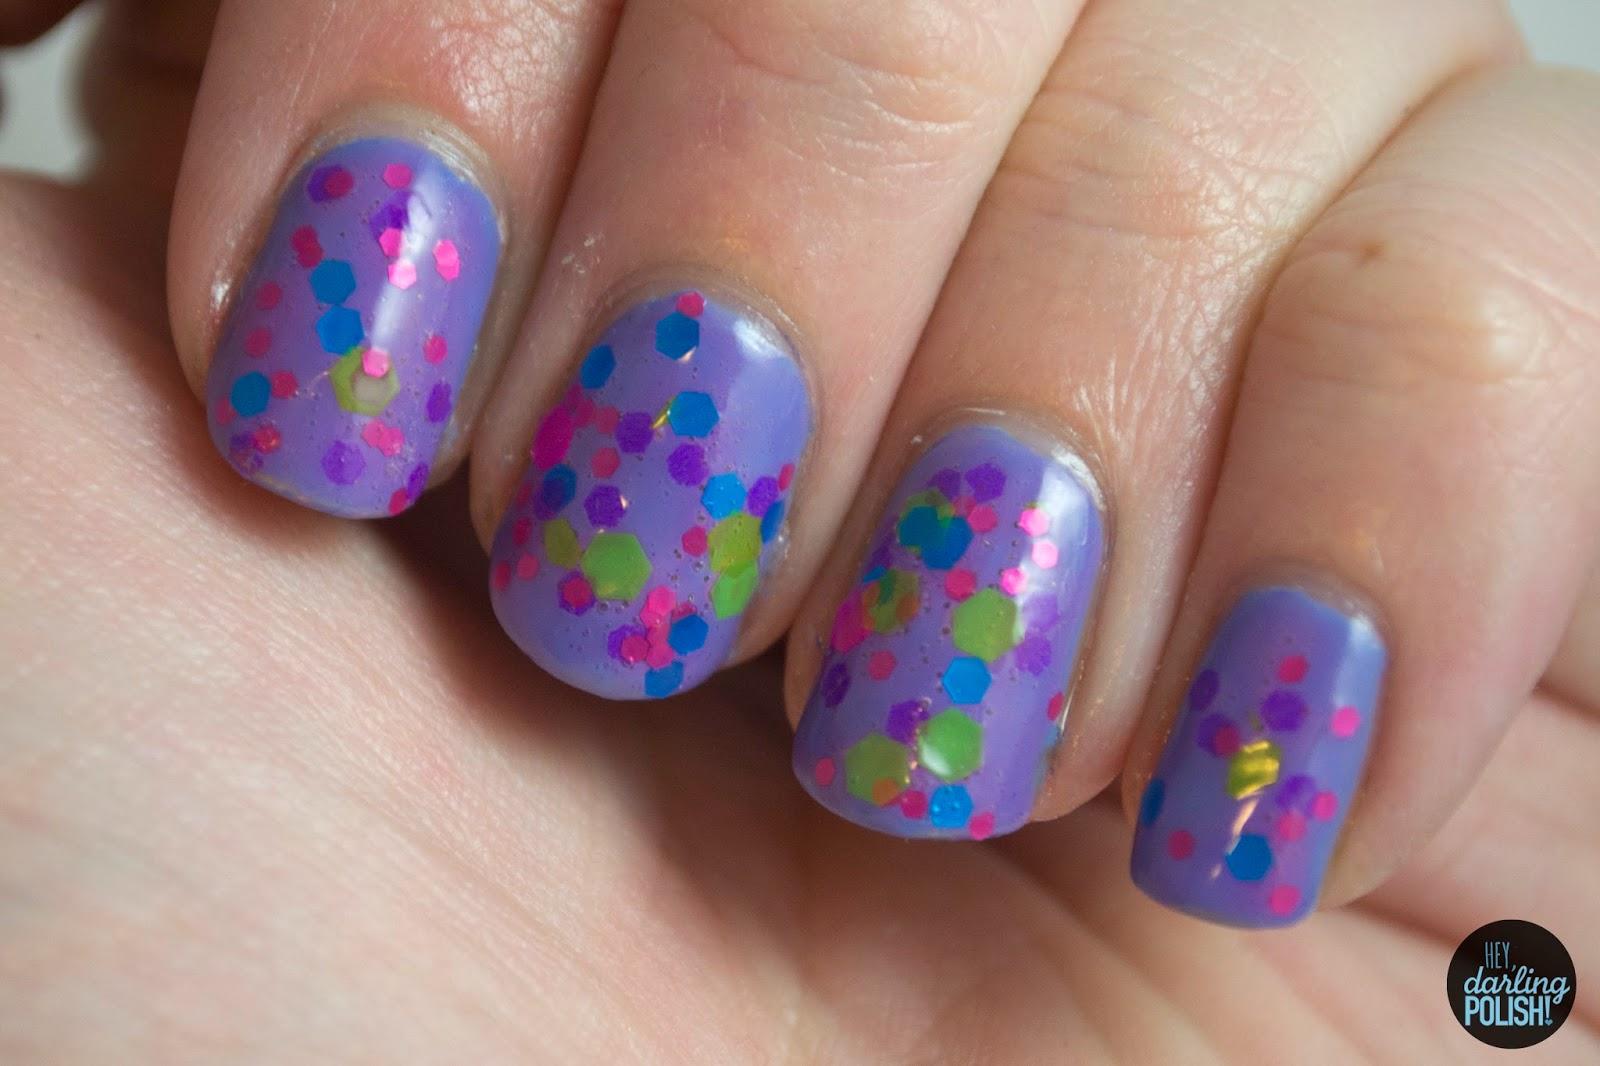 glossome polish, indie, indie polish, indie nail polish, swatch, hey darling polish, purple, girly things,